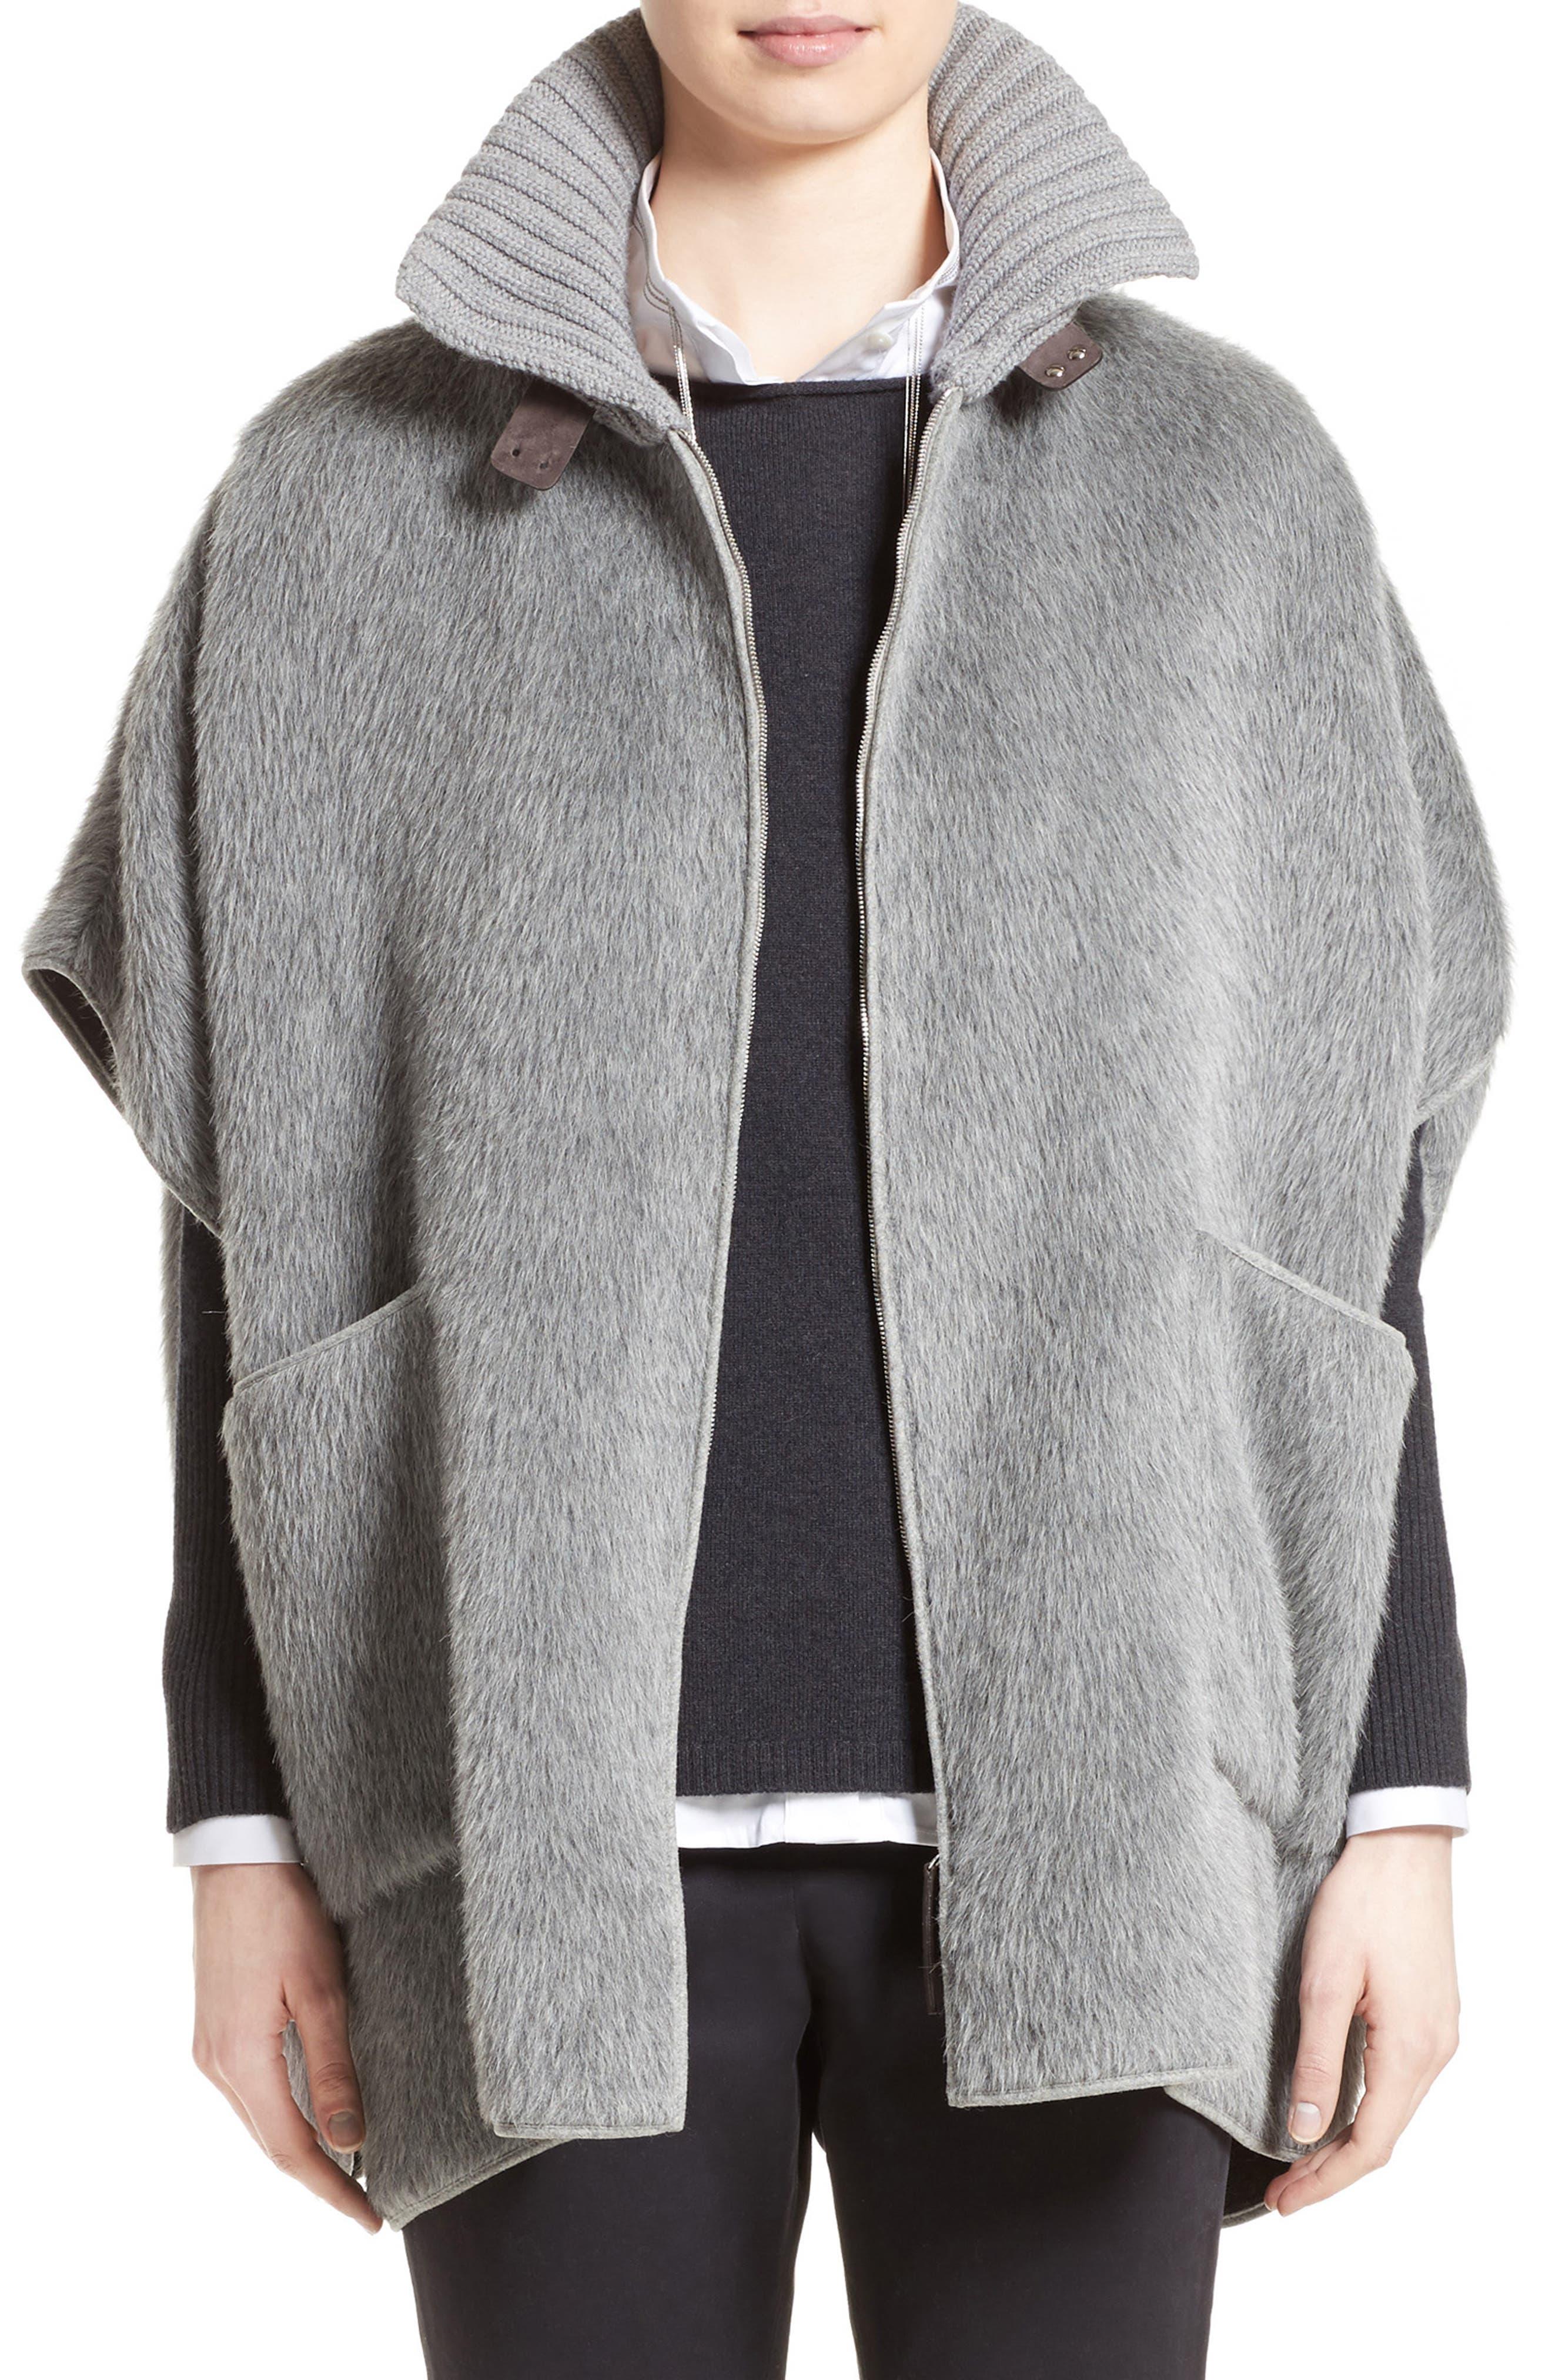 FABIANA FILIPPI Textured Alpaca & Wool Cape